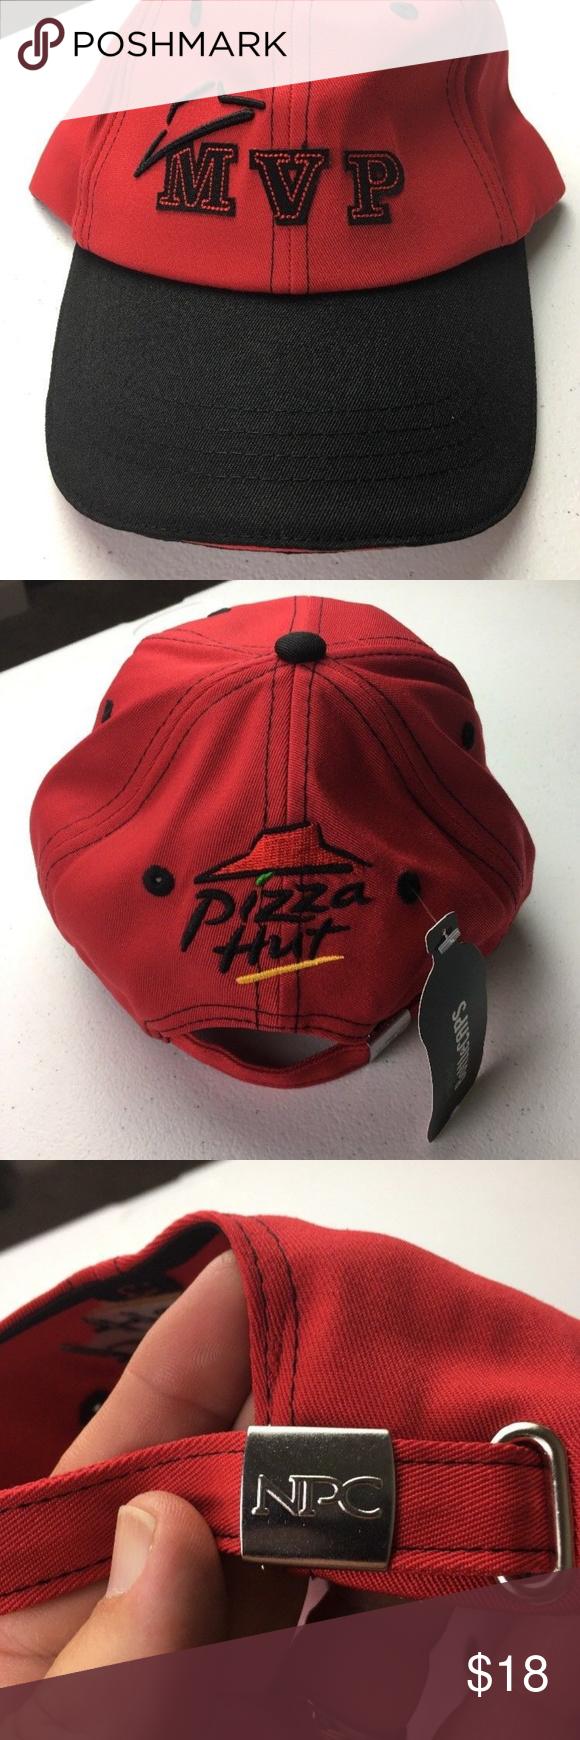 New Pizza Hut Uniform Black Red Baseball Cap Black And Red Baseball Cap Reds Baseball